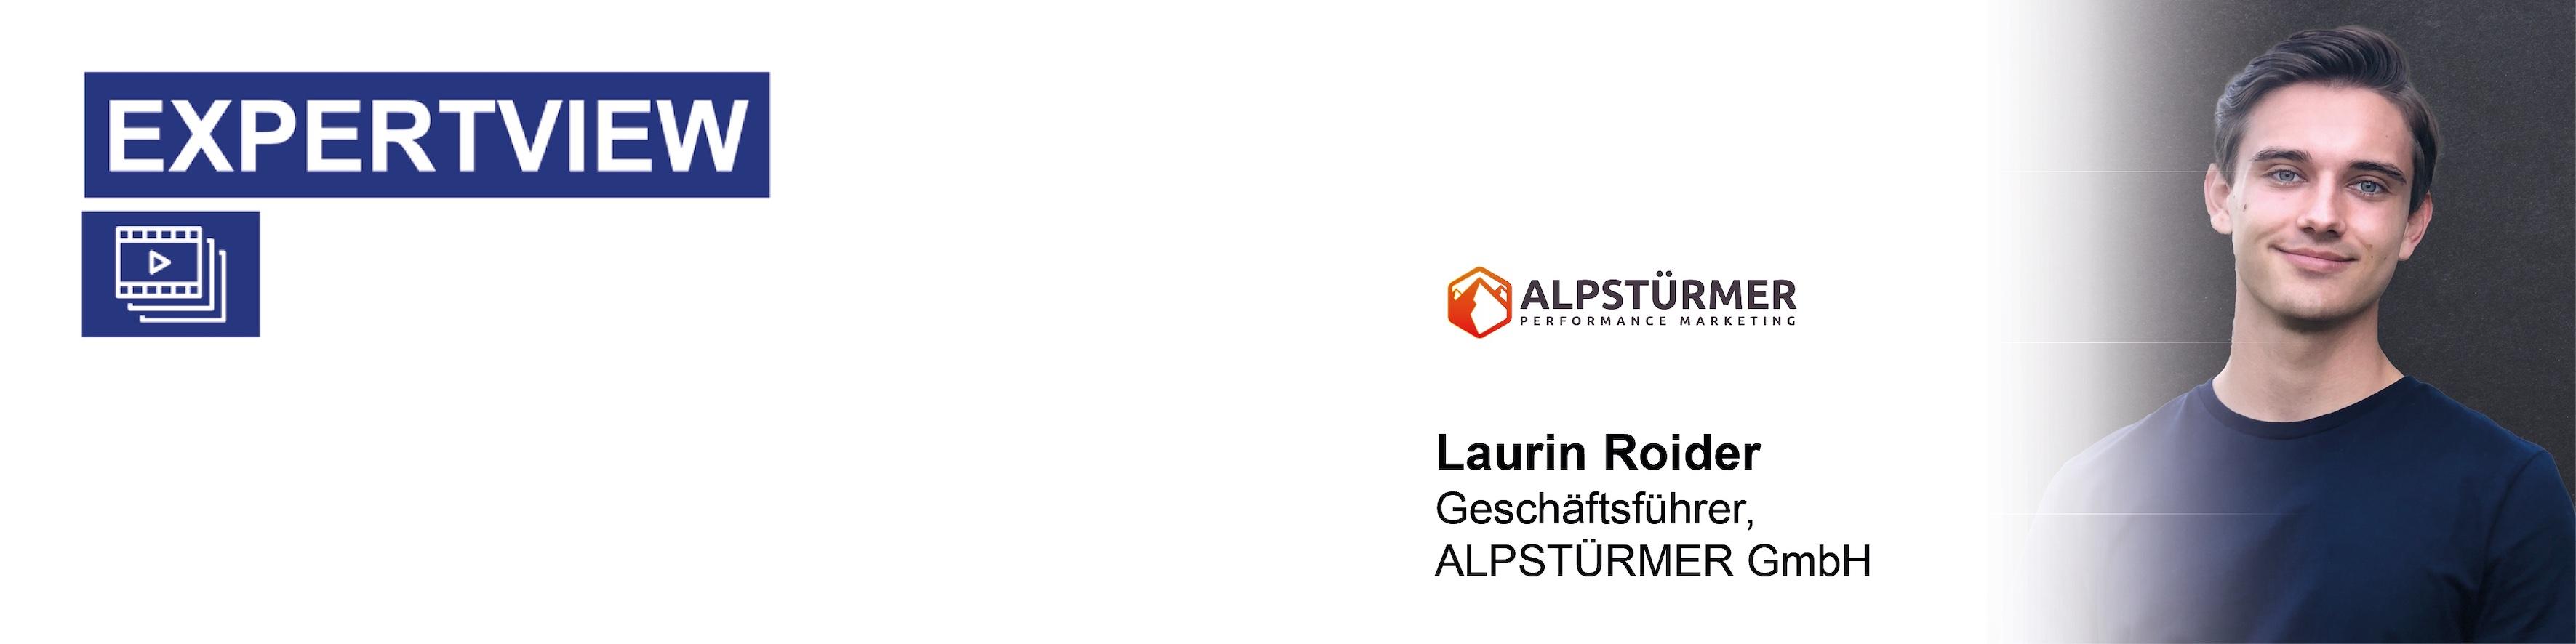 header_alpstuermer